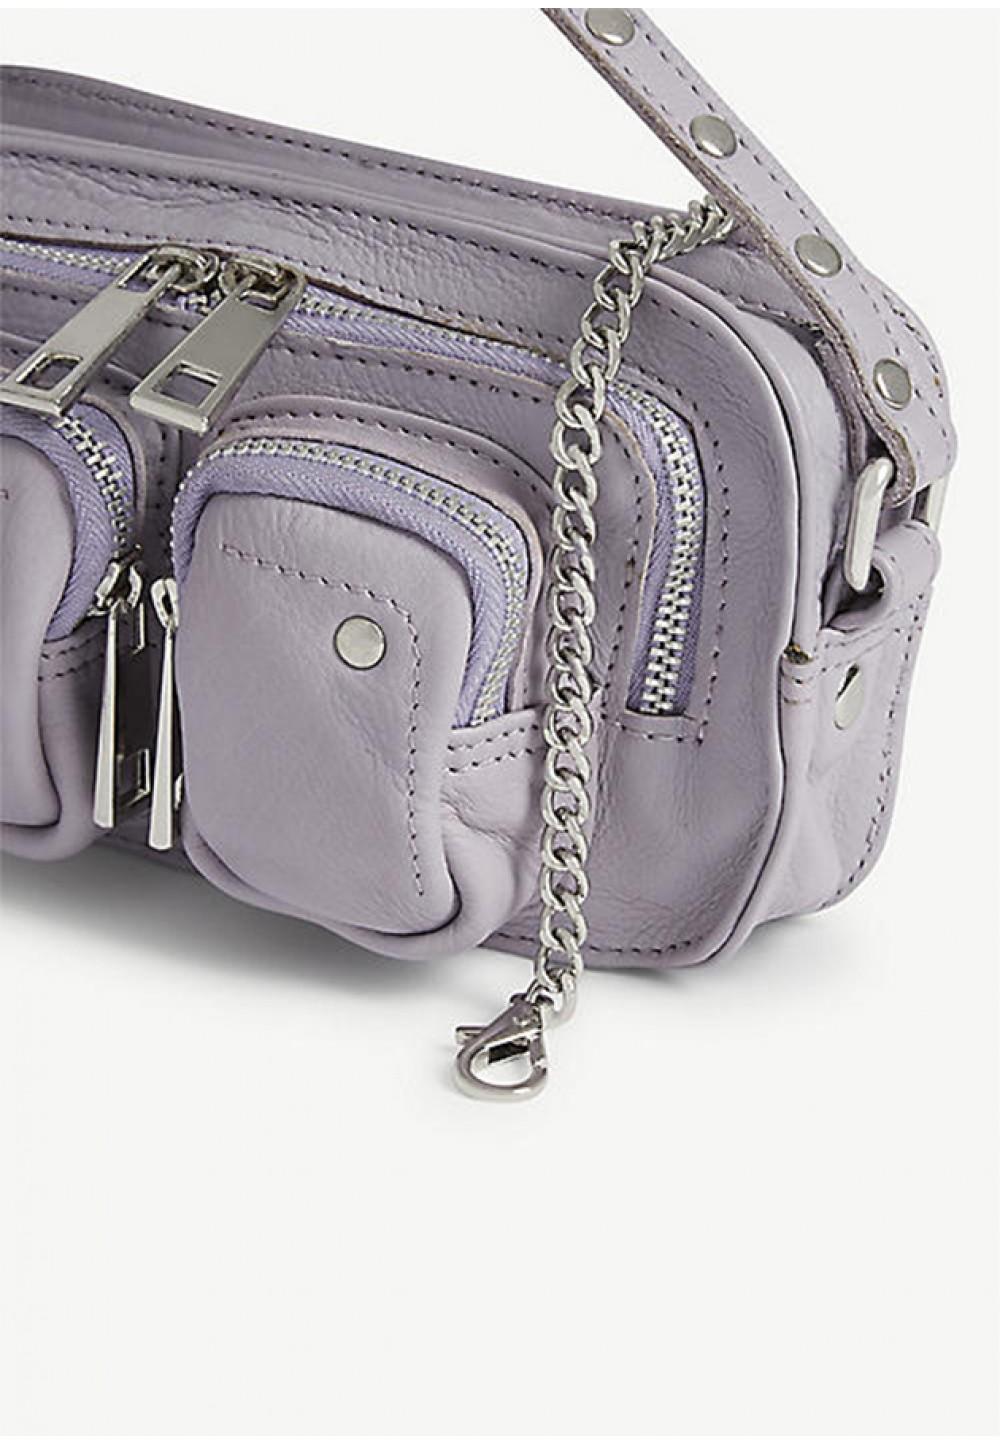 Лавандовая сумка на цепочке